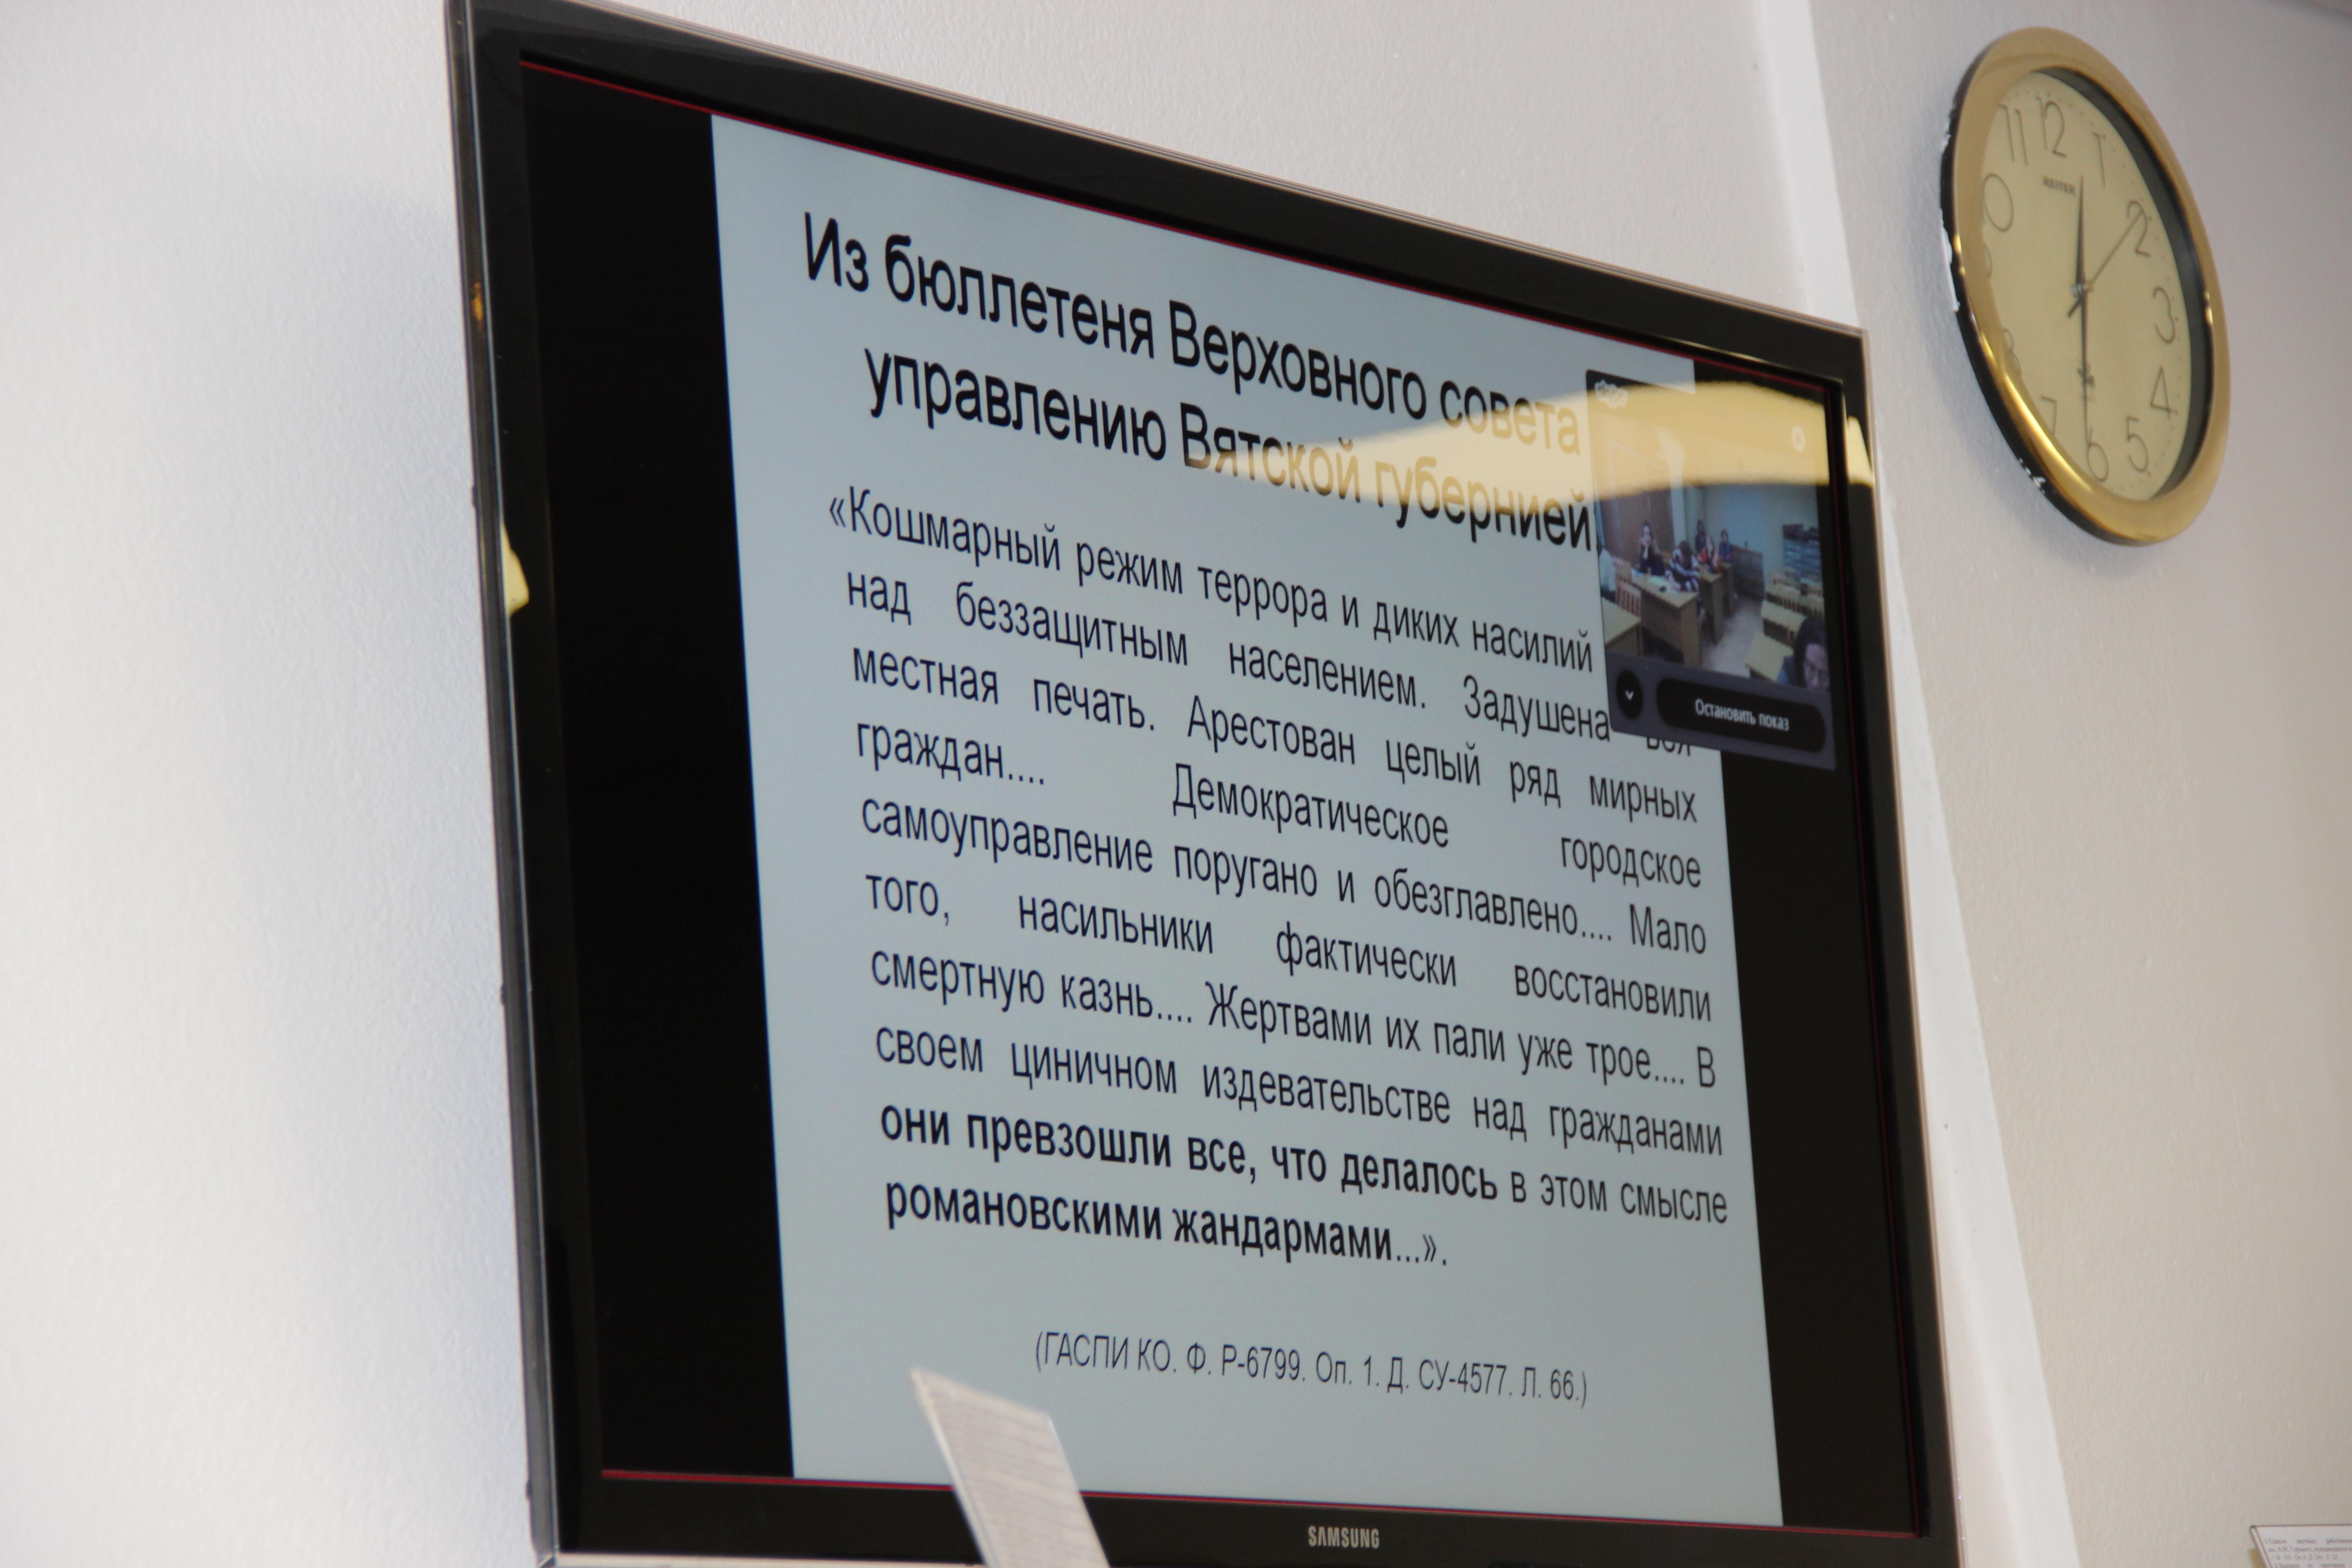 Фрагмент презентации к докладу П.А. Чемоданова